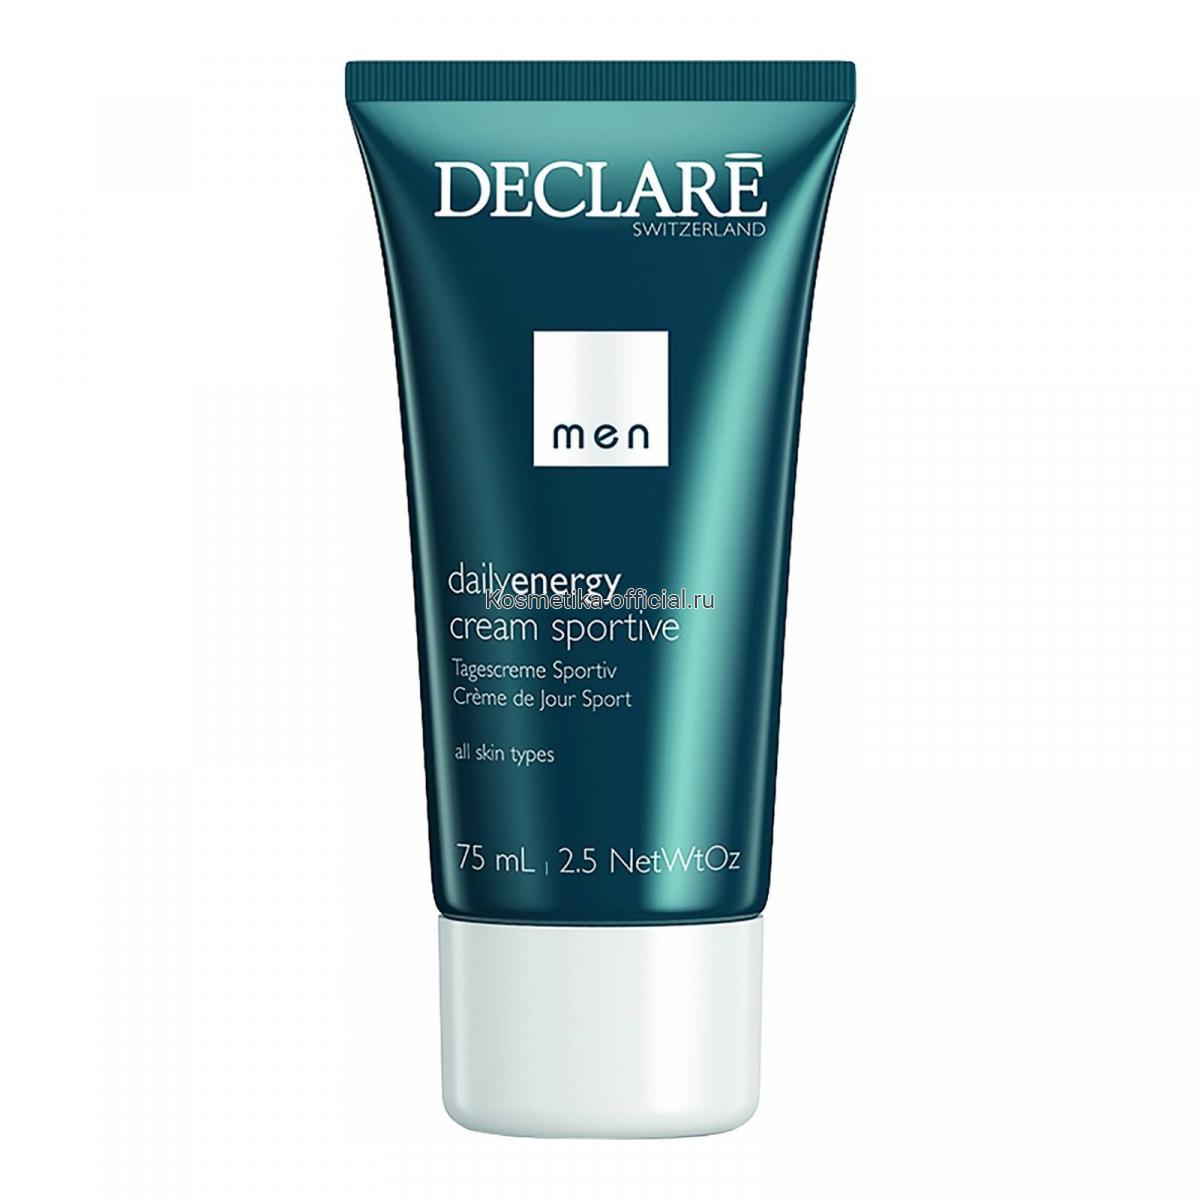 Увлажняющий крем для активных мужчин DailyEnergy Cream Sportive 75 мл